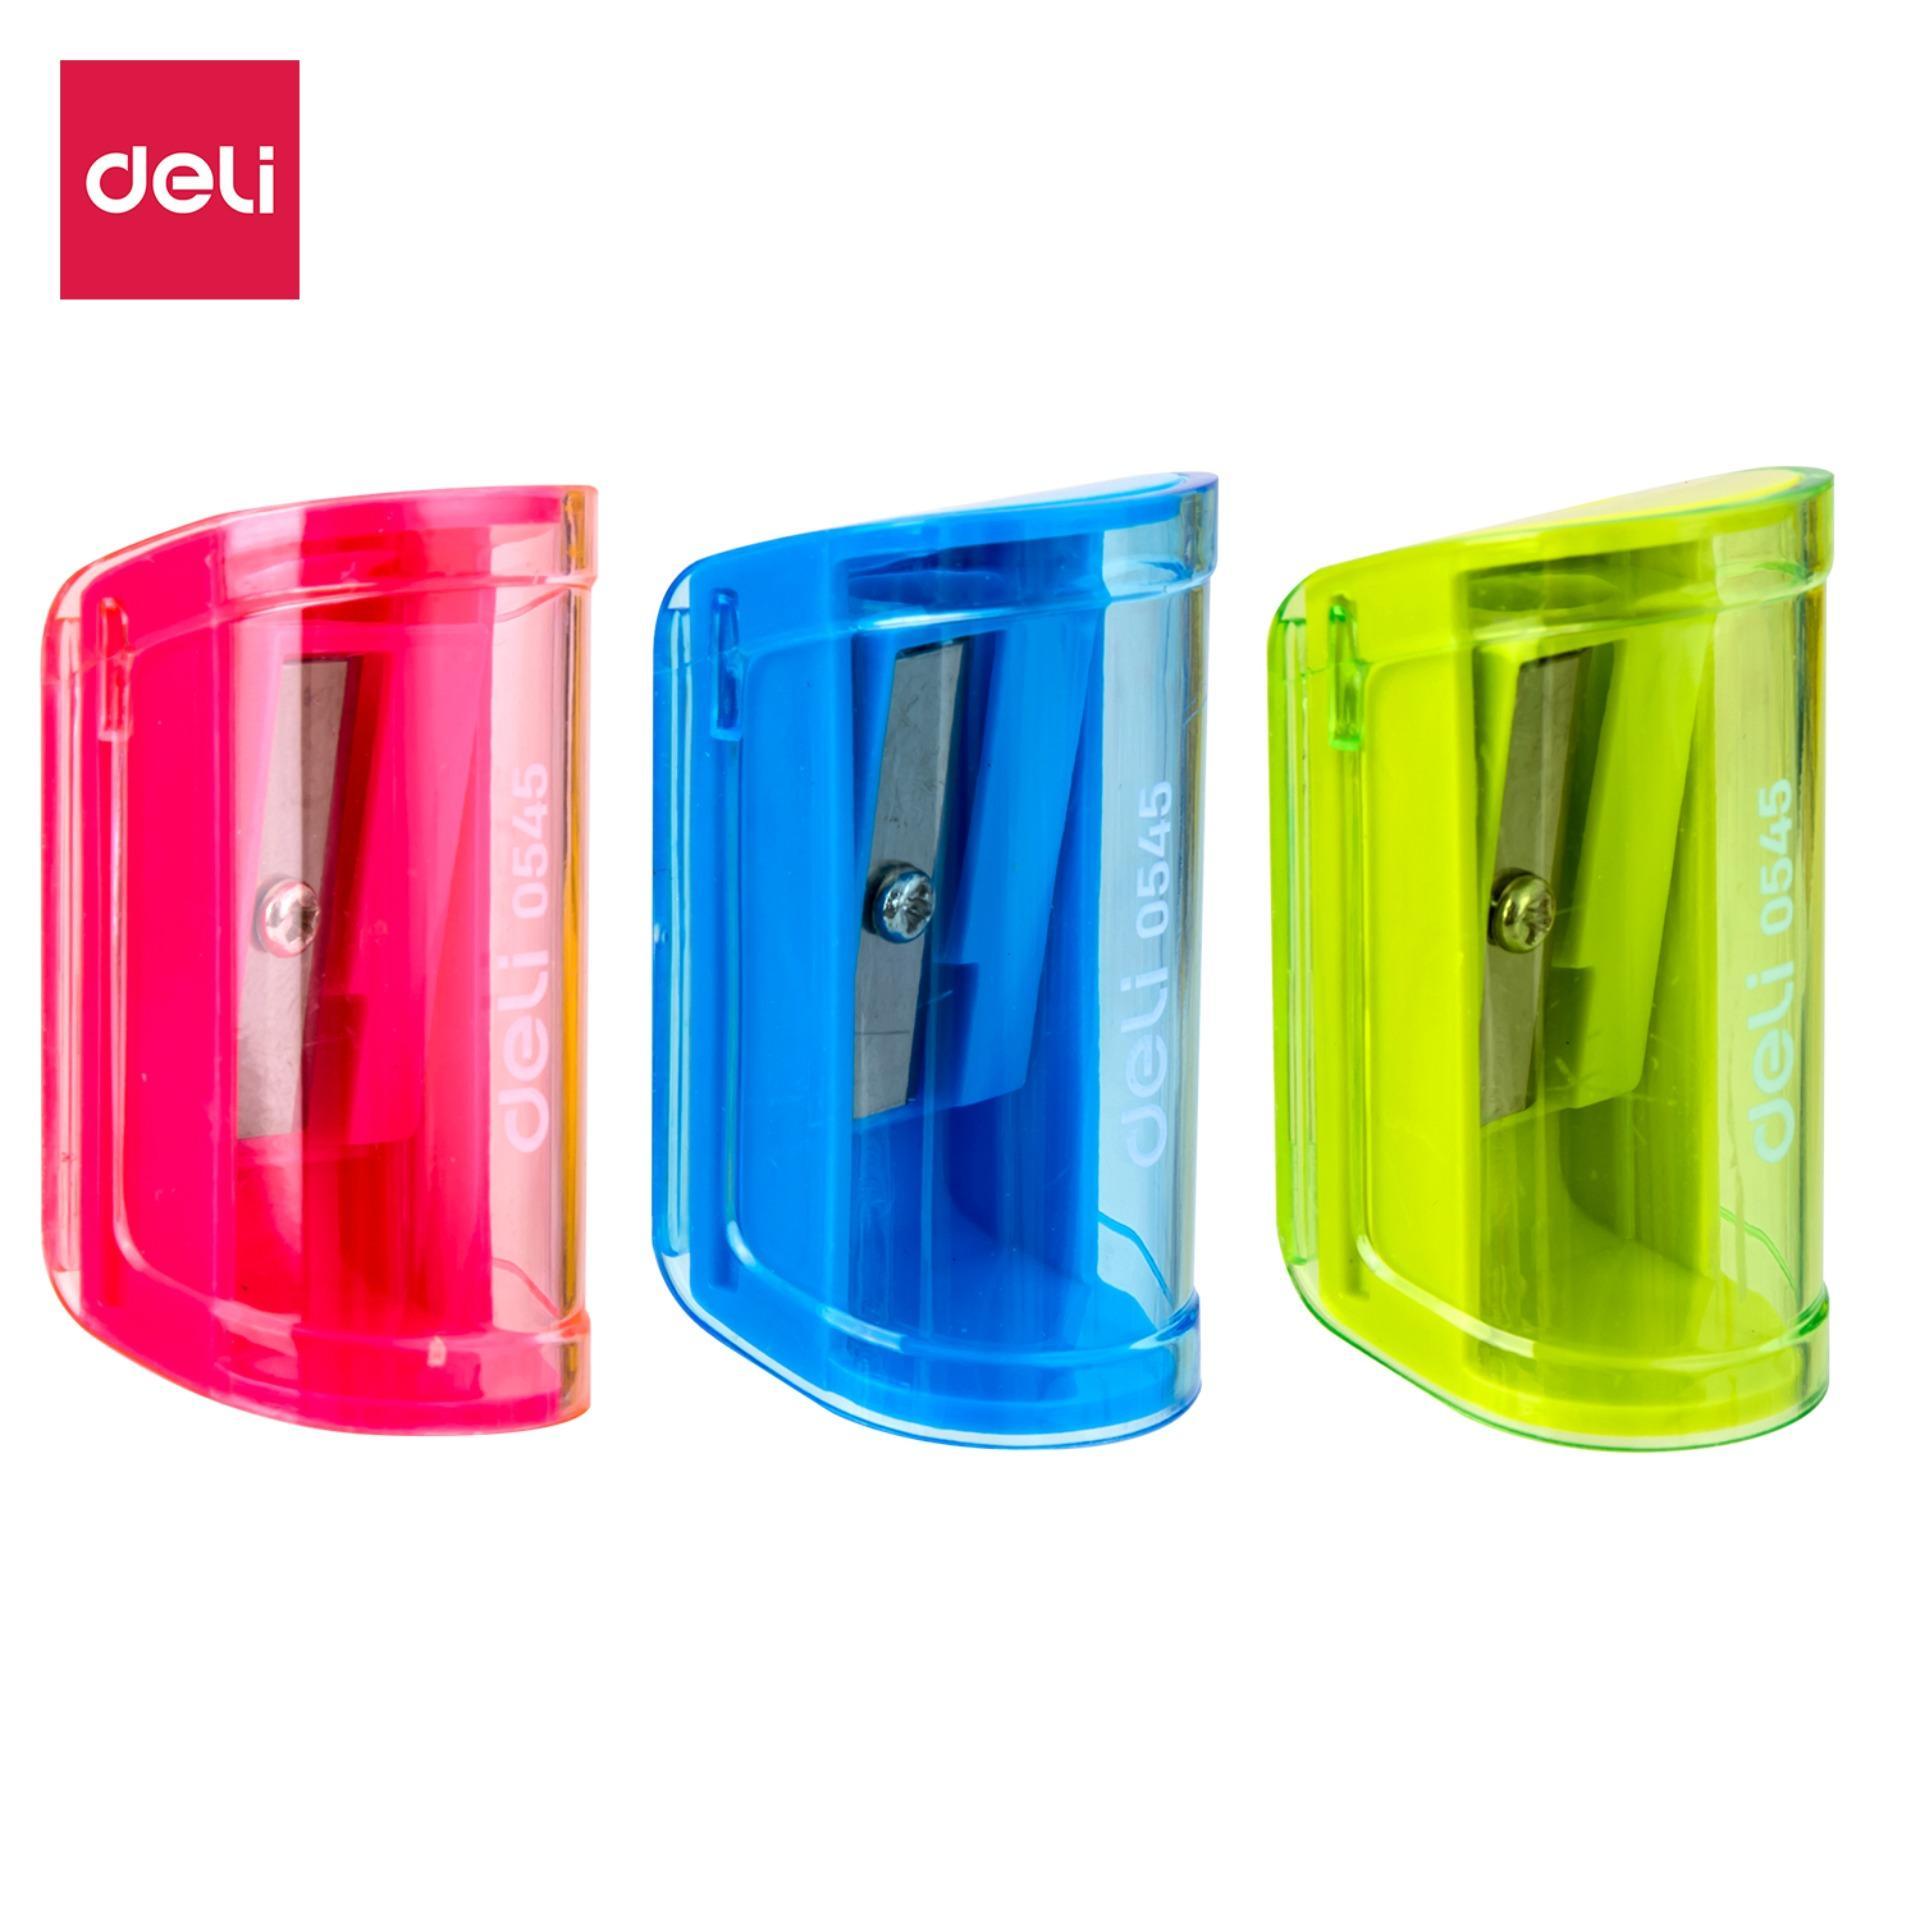 Deli E0545 Pencil Sharpener/rautan - 1-Hole Sharpener W/canister φ7mm 3c - Random Color To Send By Deli Official Store.